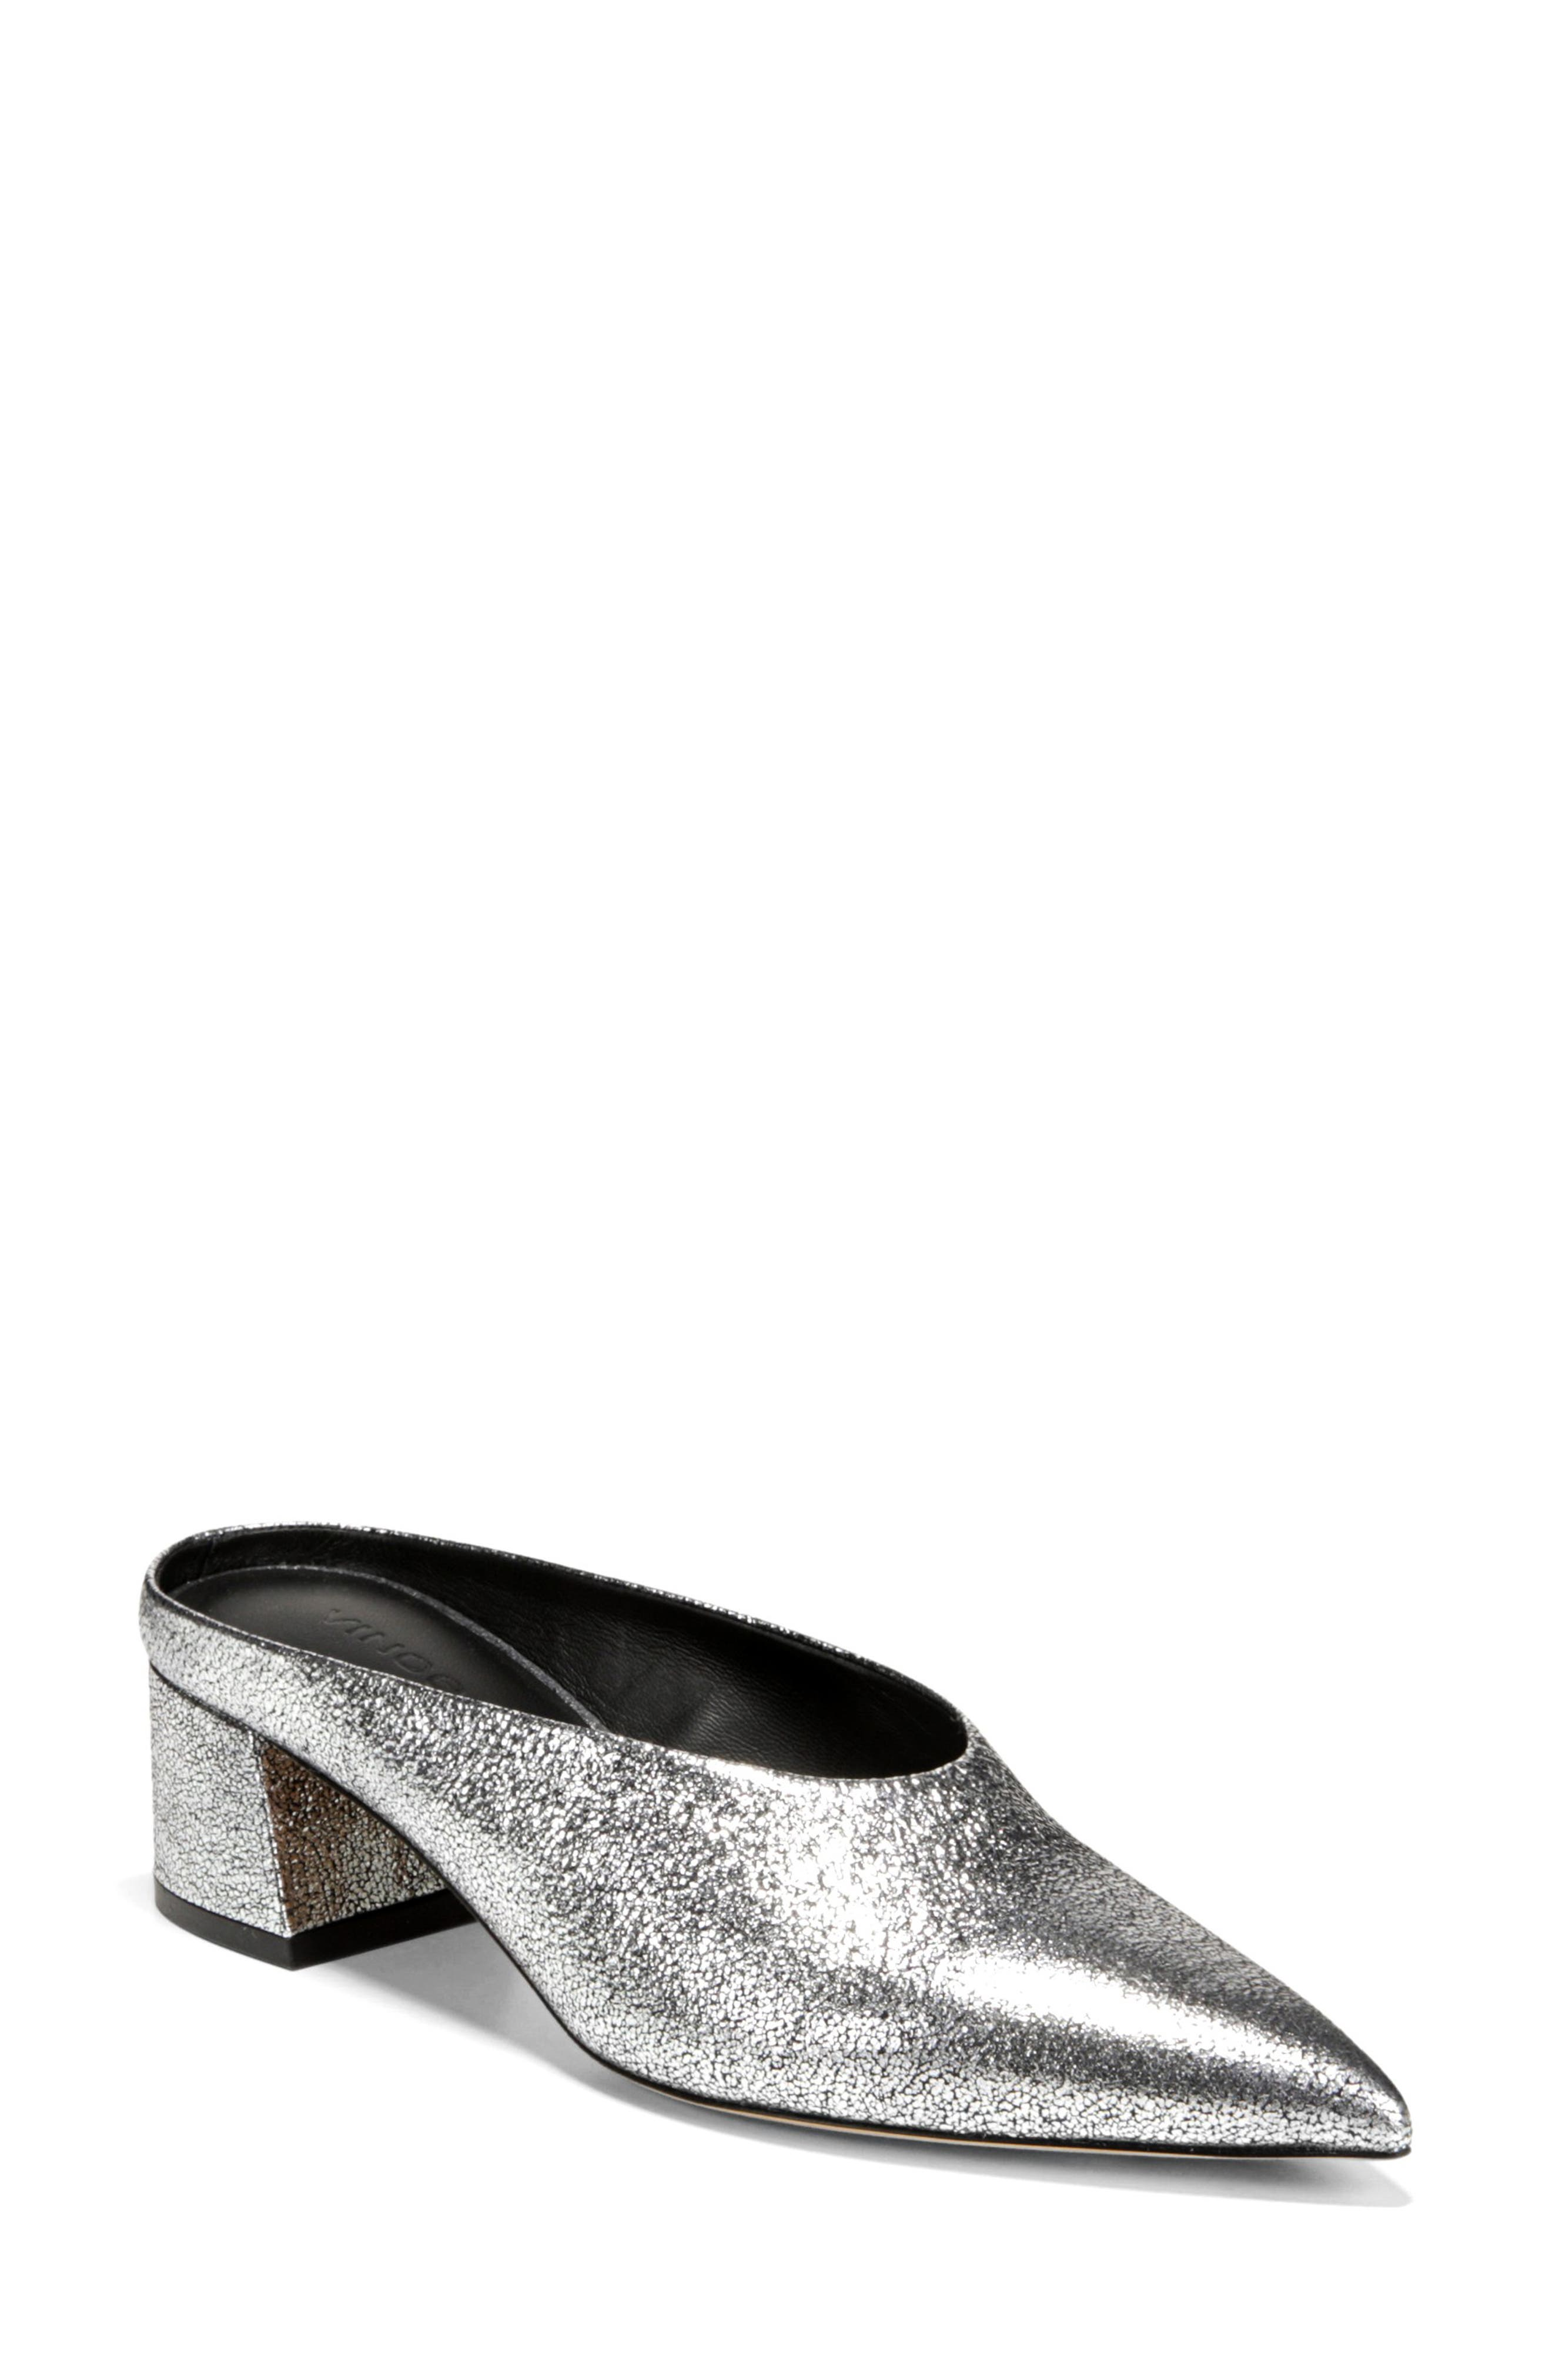 Ralston Pointy Toe Mule,                         Main,                         color, SILVER METALLIC